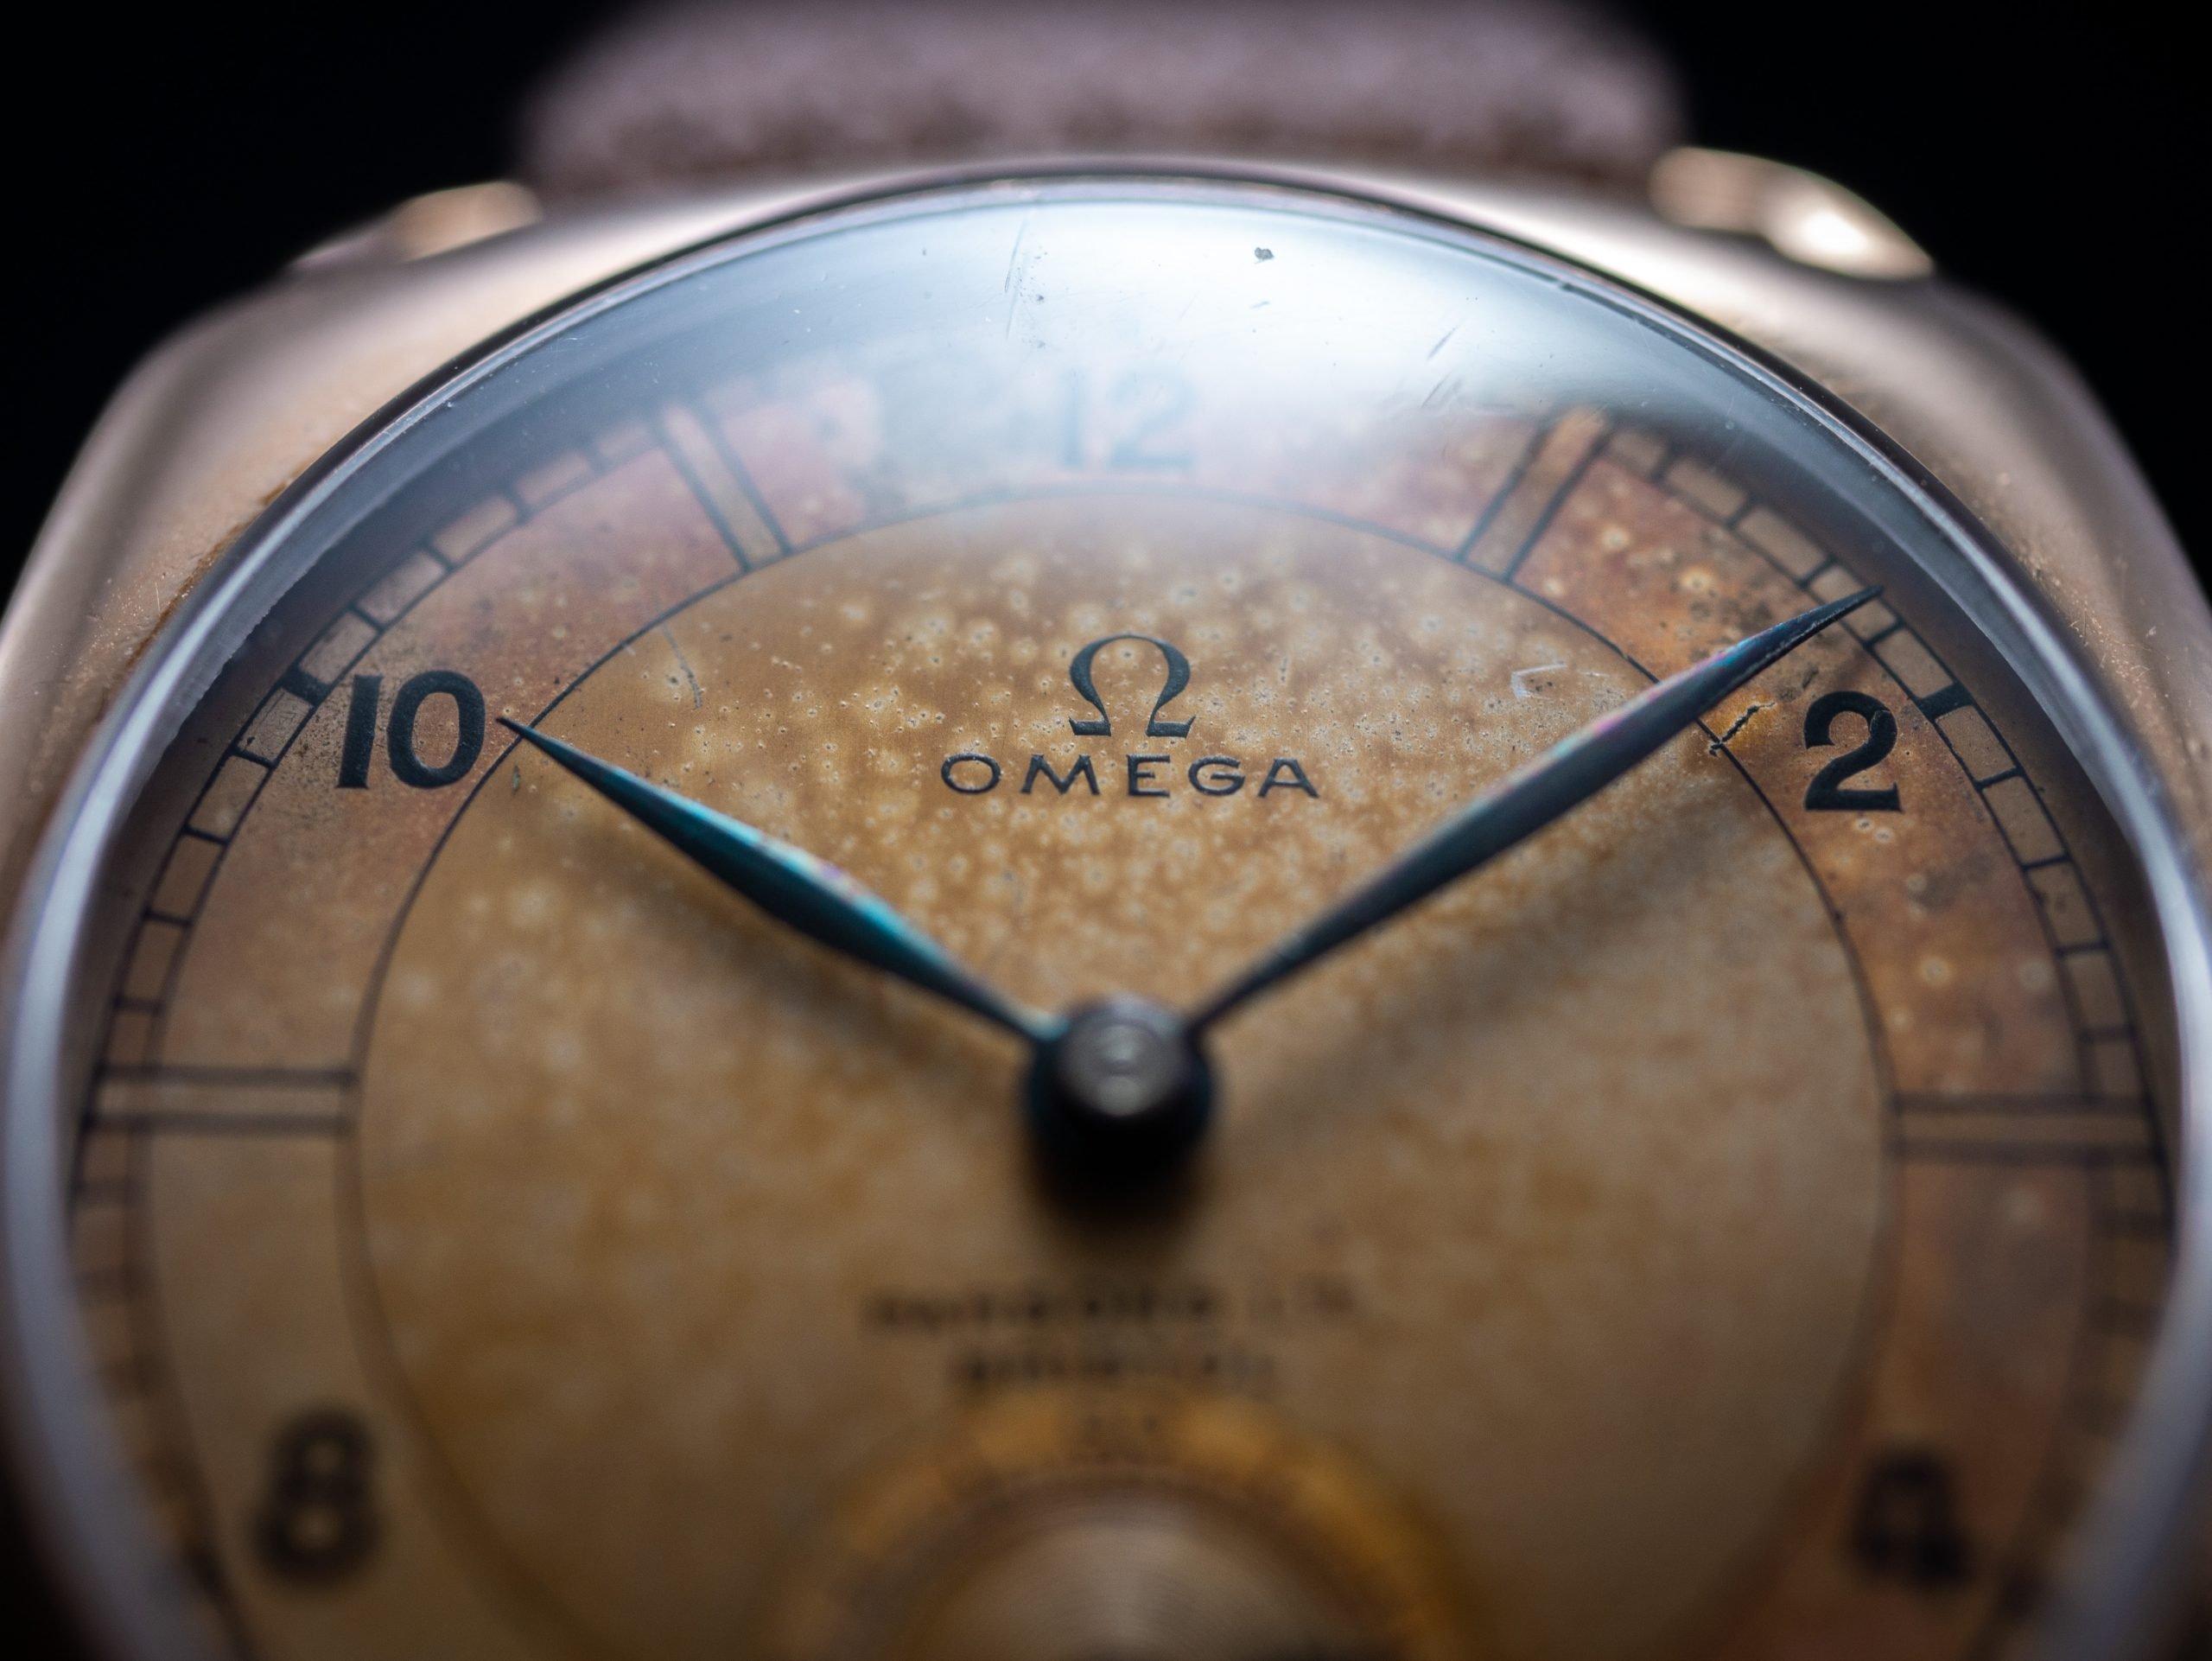 vintage Omega Sector Dial 'Parsons LTD Bristol' Signing Cushion Case cal. 26.5 pre war